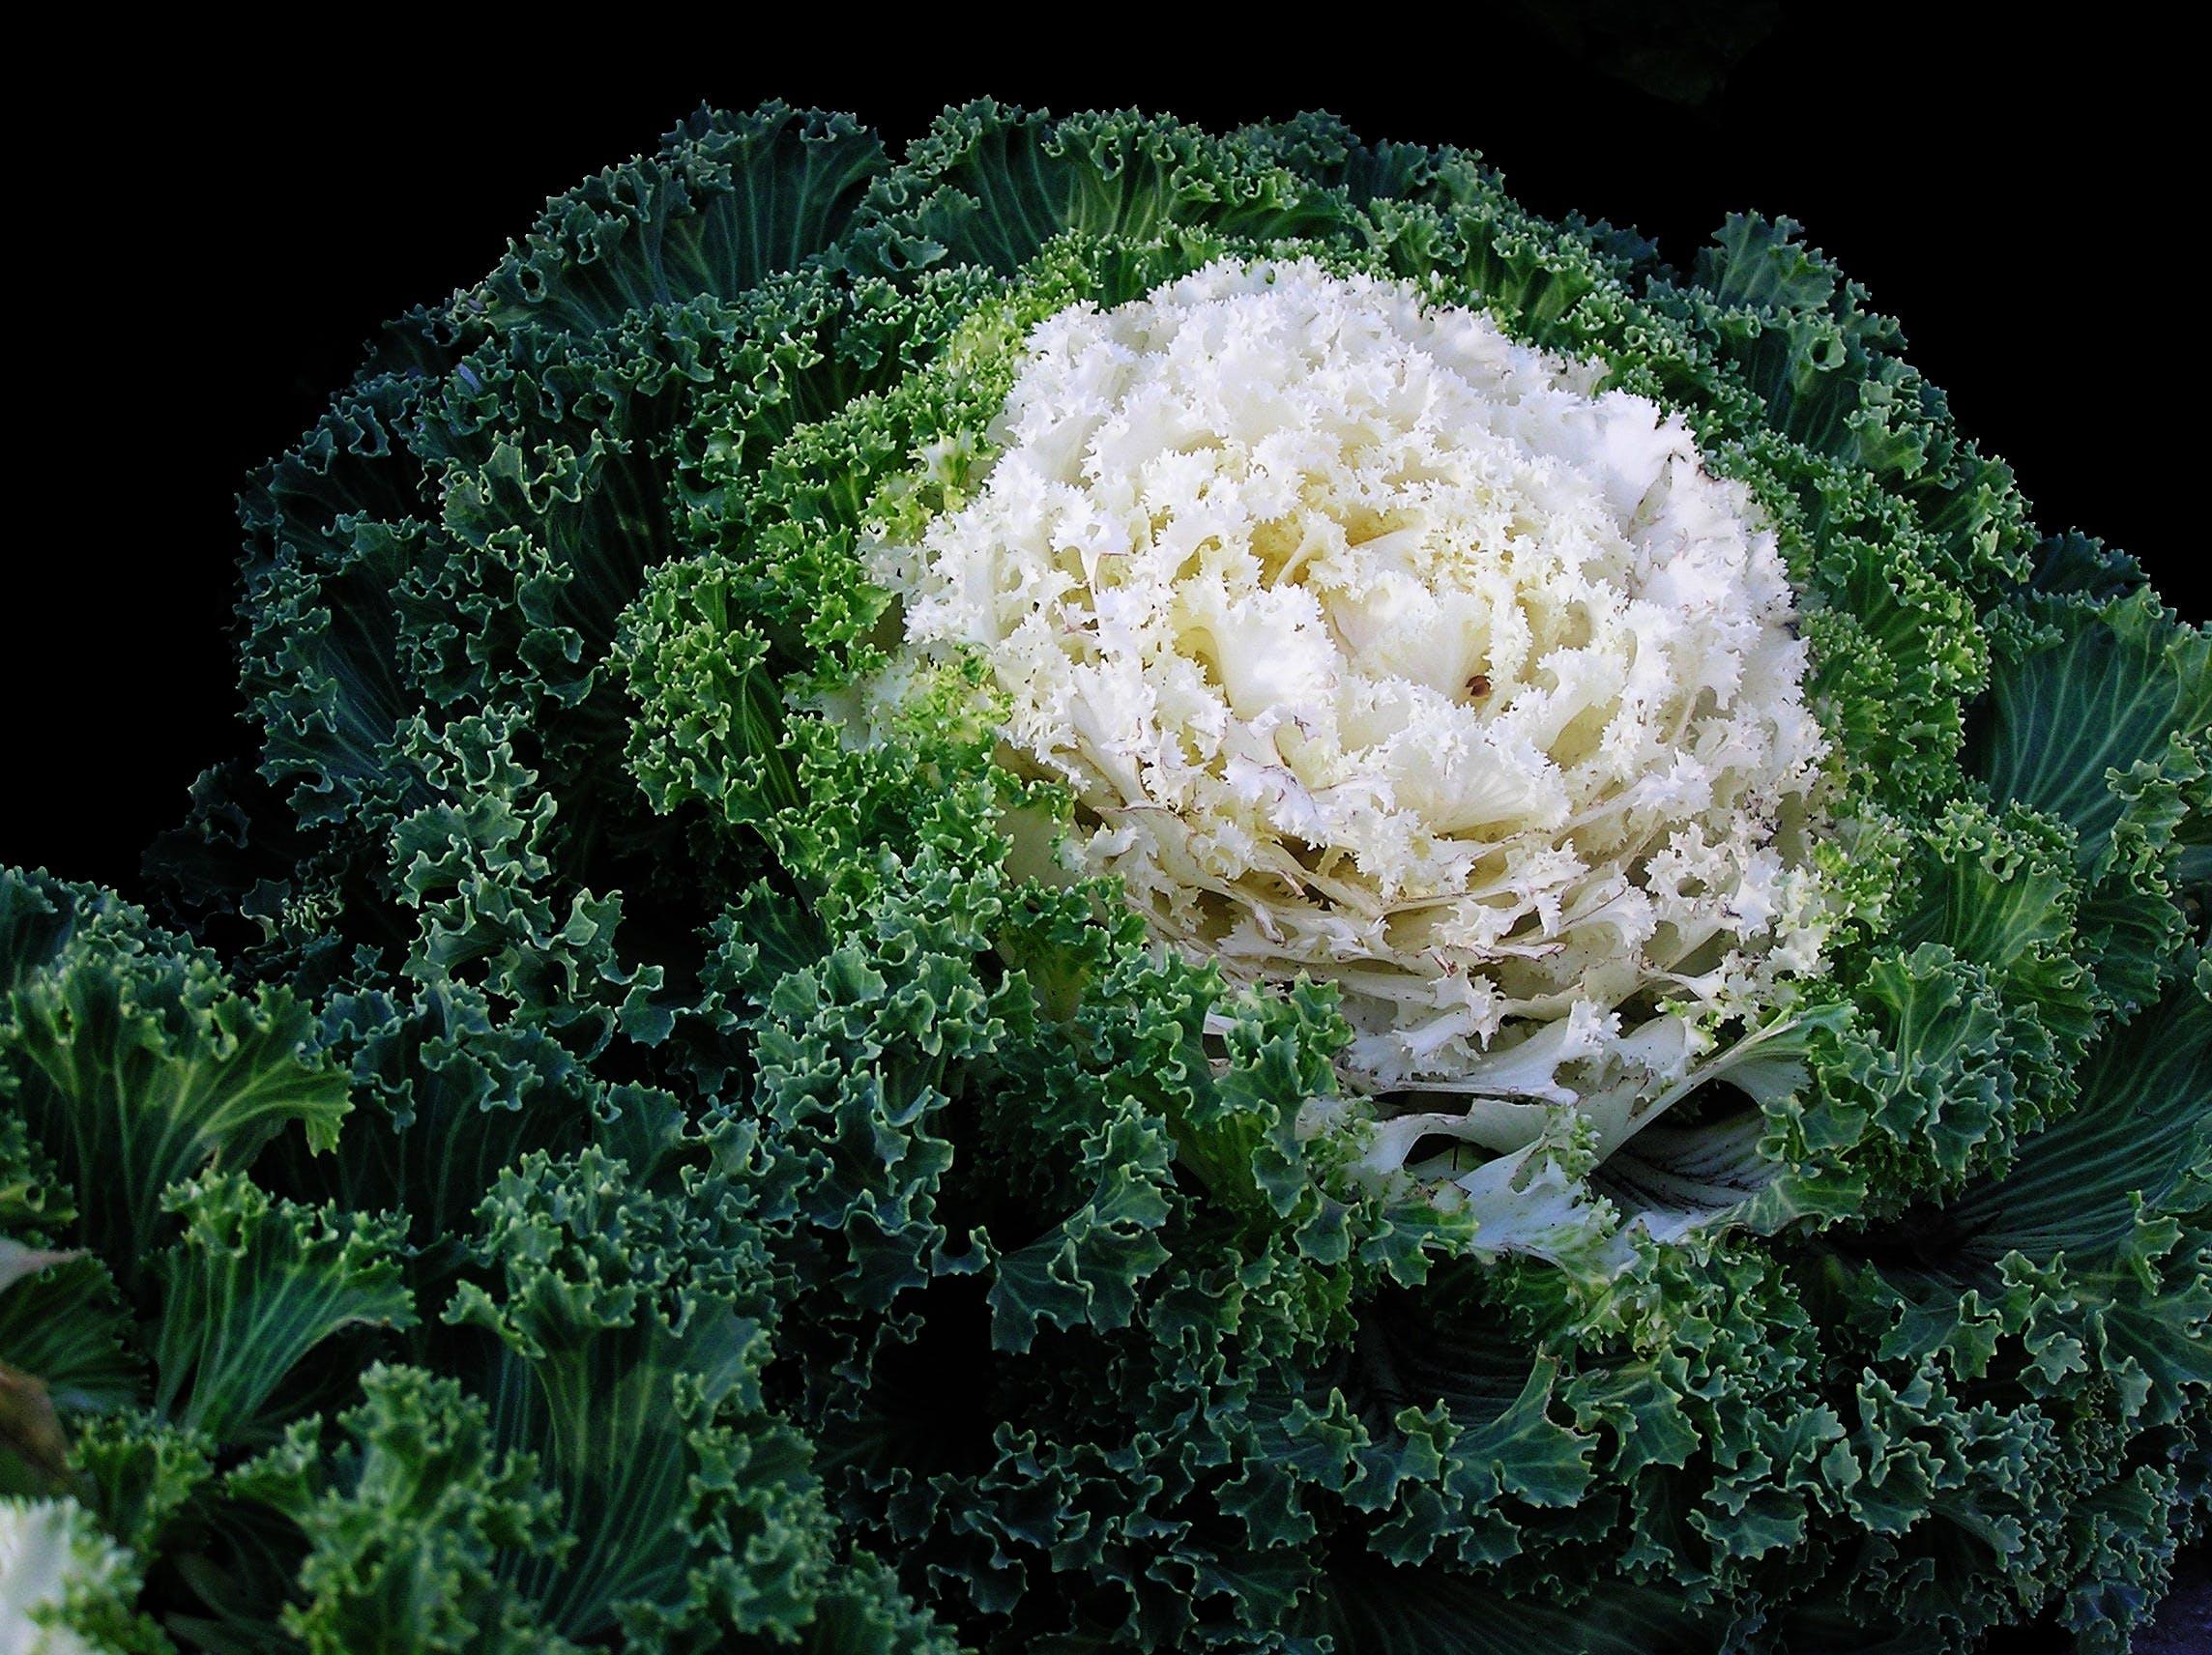 Close-up of Fresh Green Plants